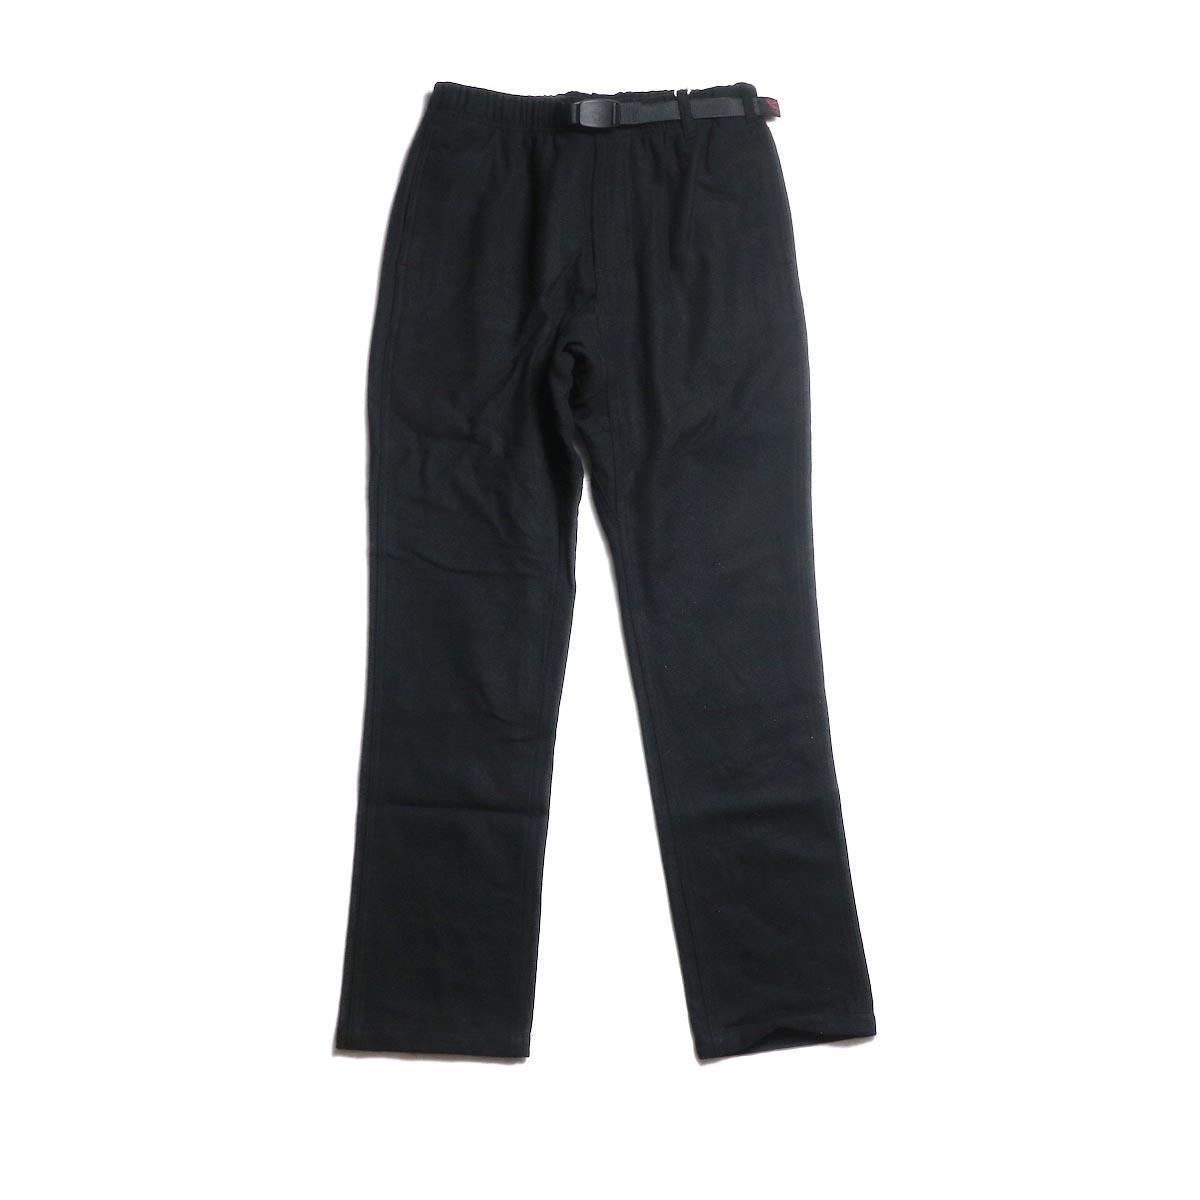 GRAMICCI / WOOL BLEND NN-PANTS JUST CUT (Black)